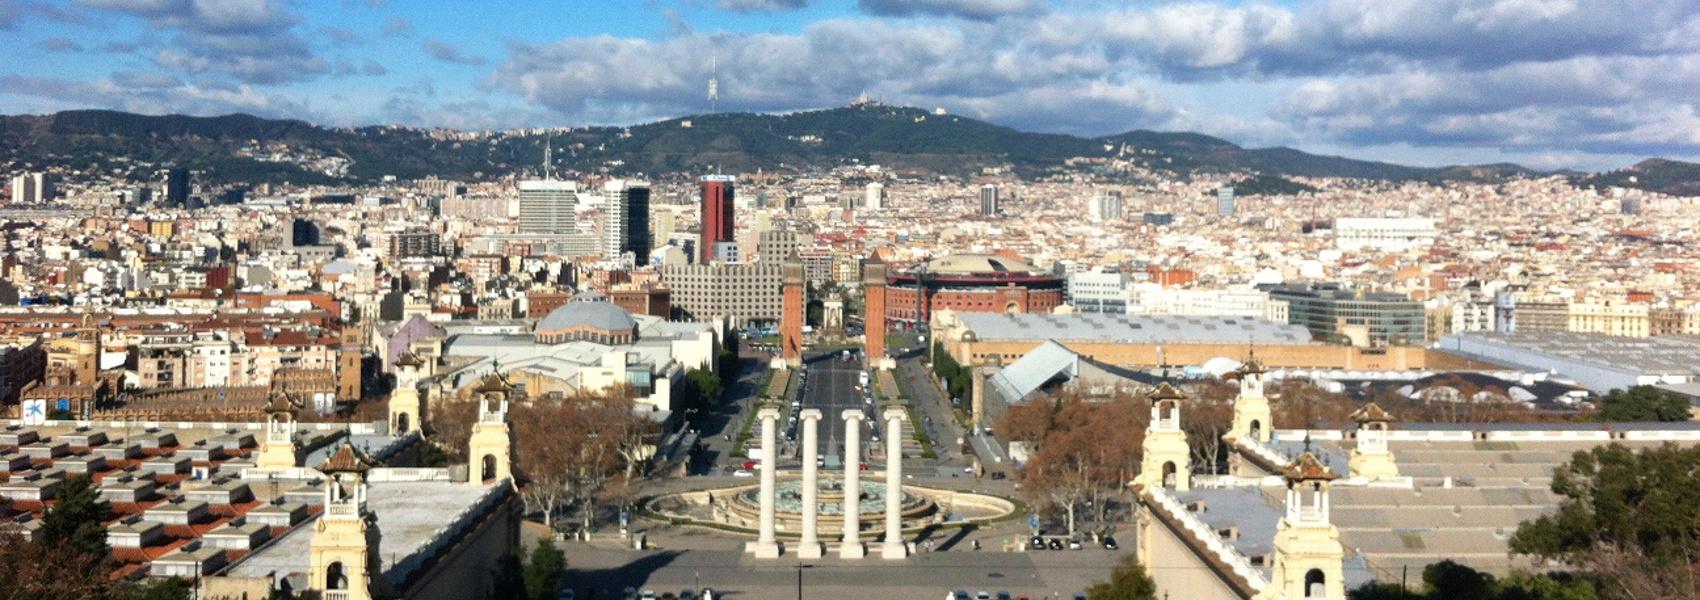 Cerrajero Sants Monjuïc - Cerrajeros 24h Sants Montjuïc, Cerrajero Sants Montjuïc